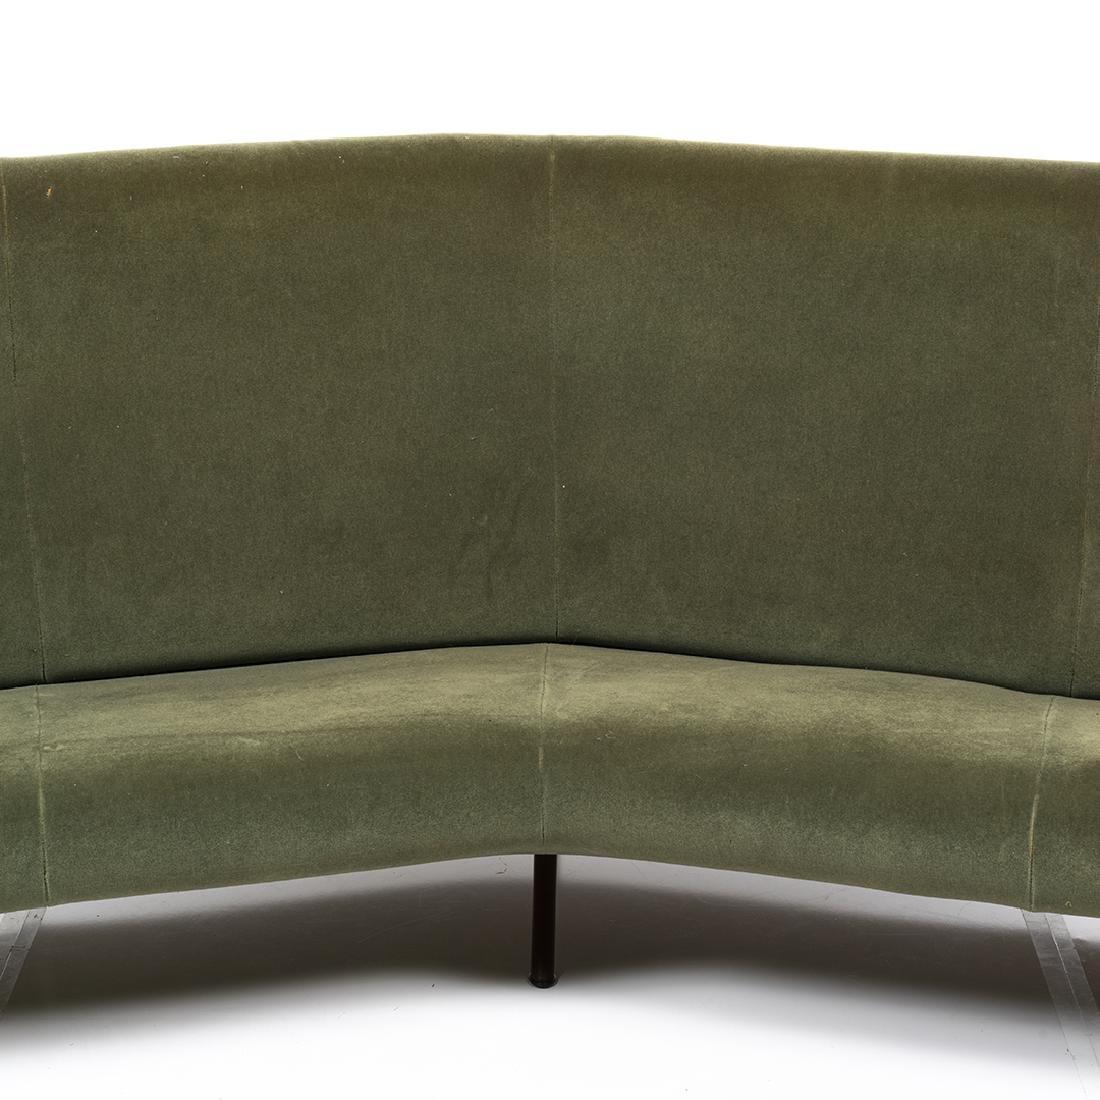 Marco Zanuso Triennale Sofa - 3